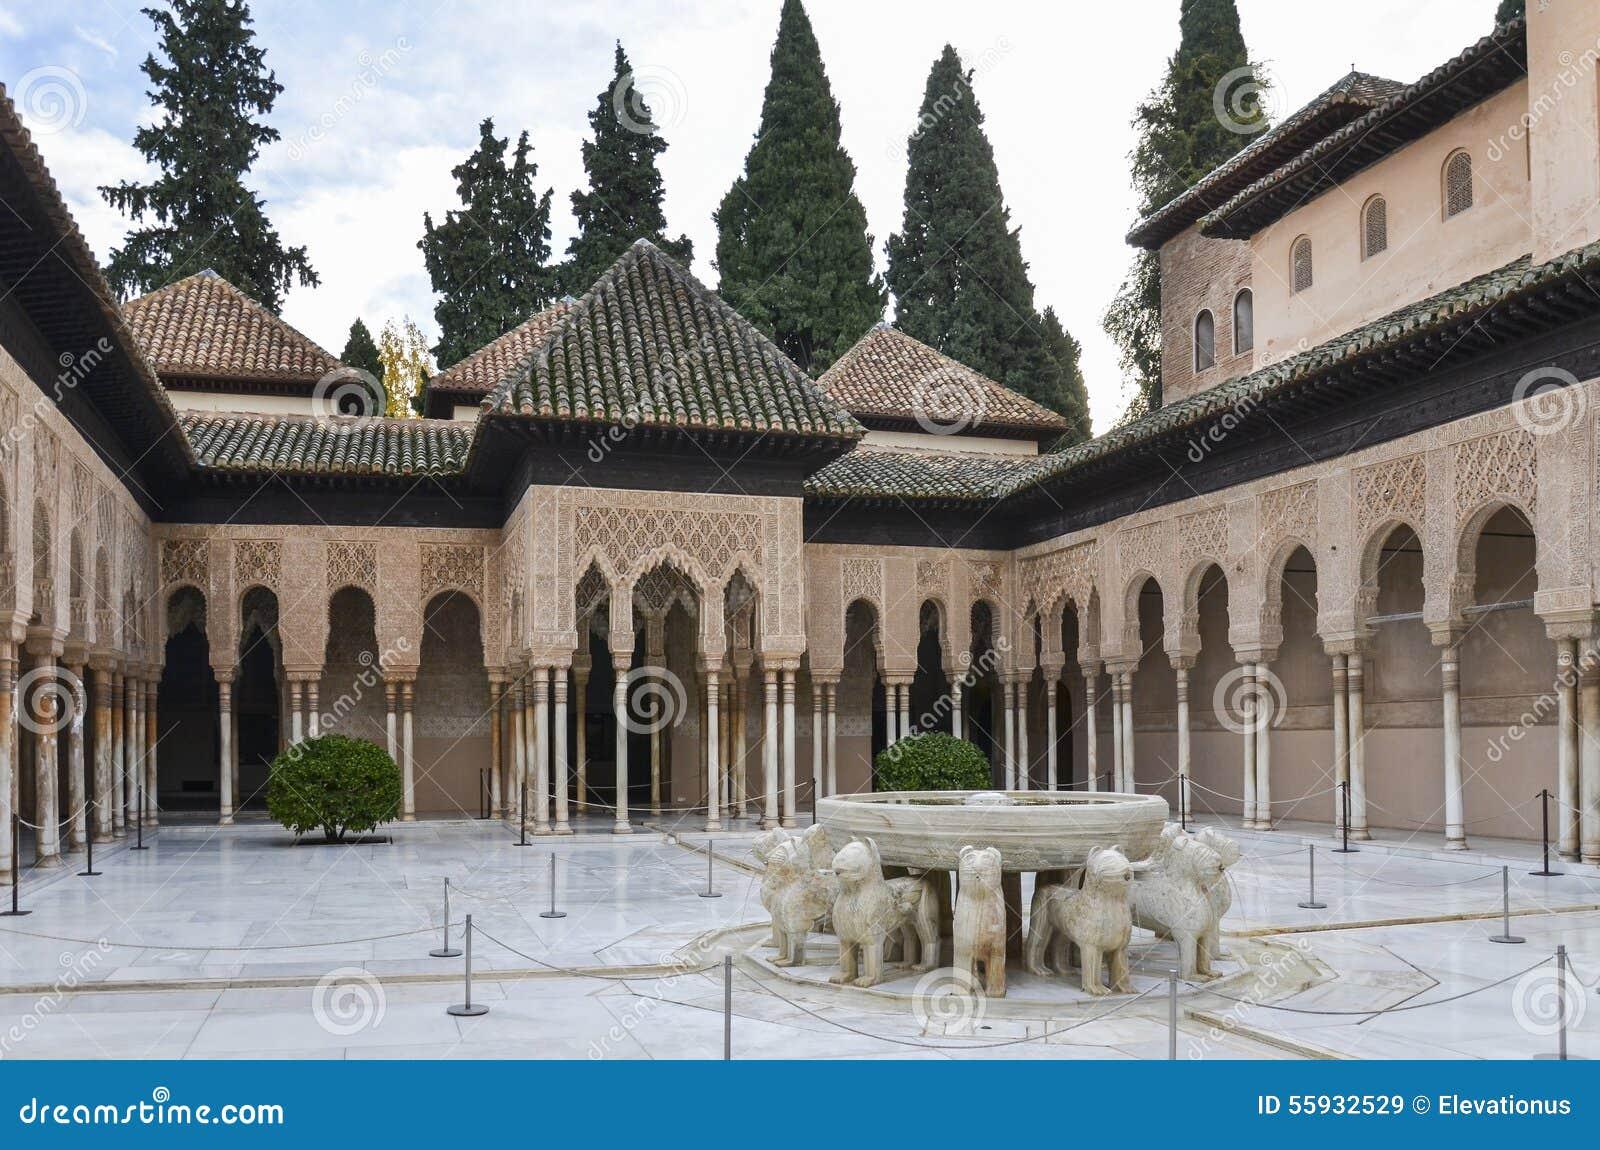 Lions Patio In Alhambra Granada Spain Stock Image Image Of Islam